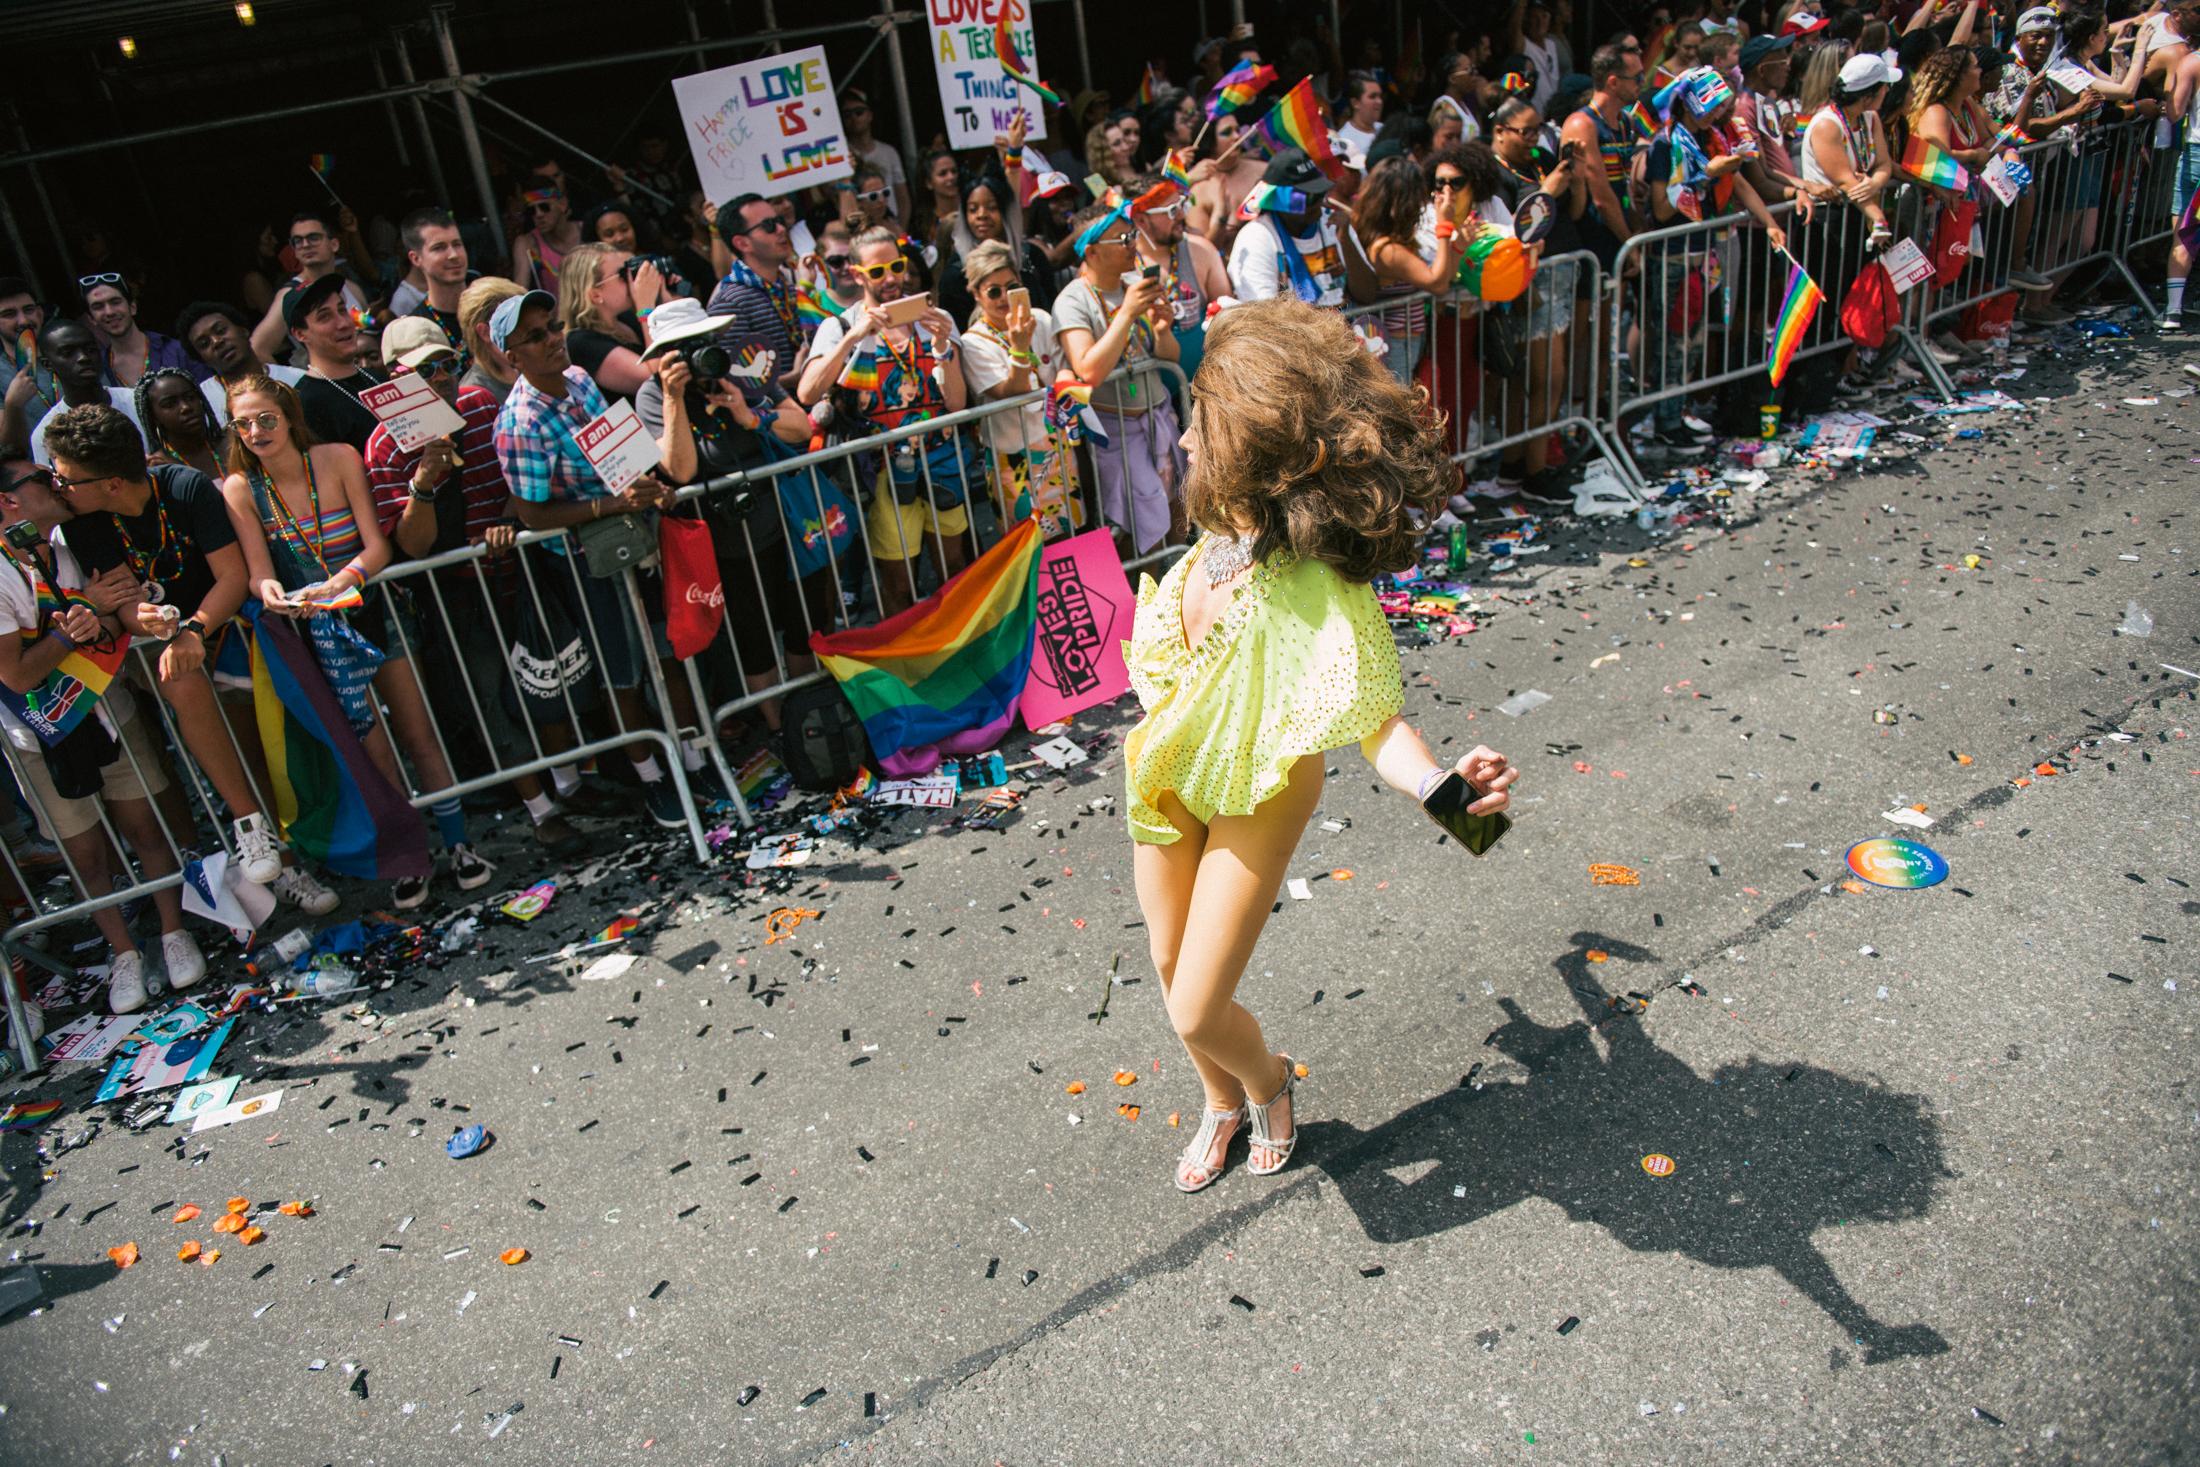 BBakus_LOREAL_Pride-223.jpg